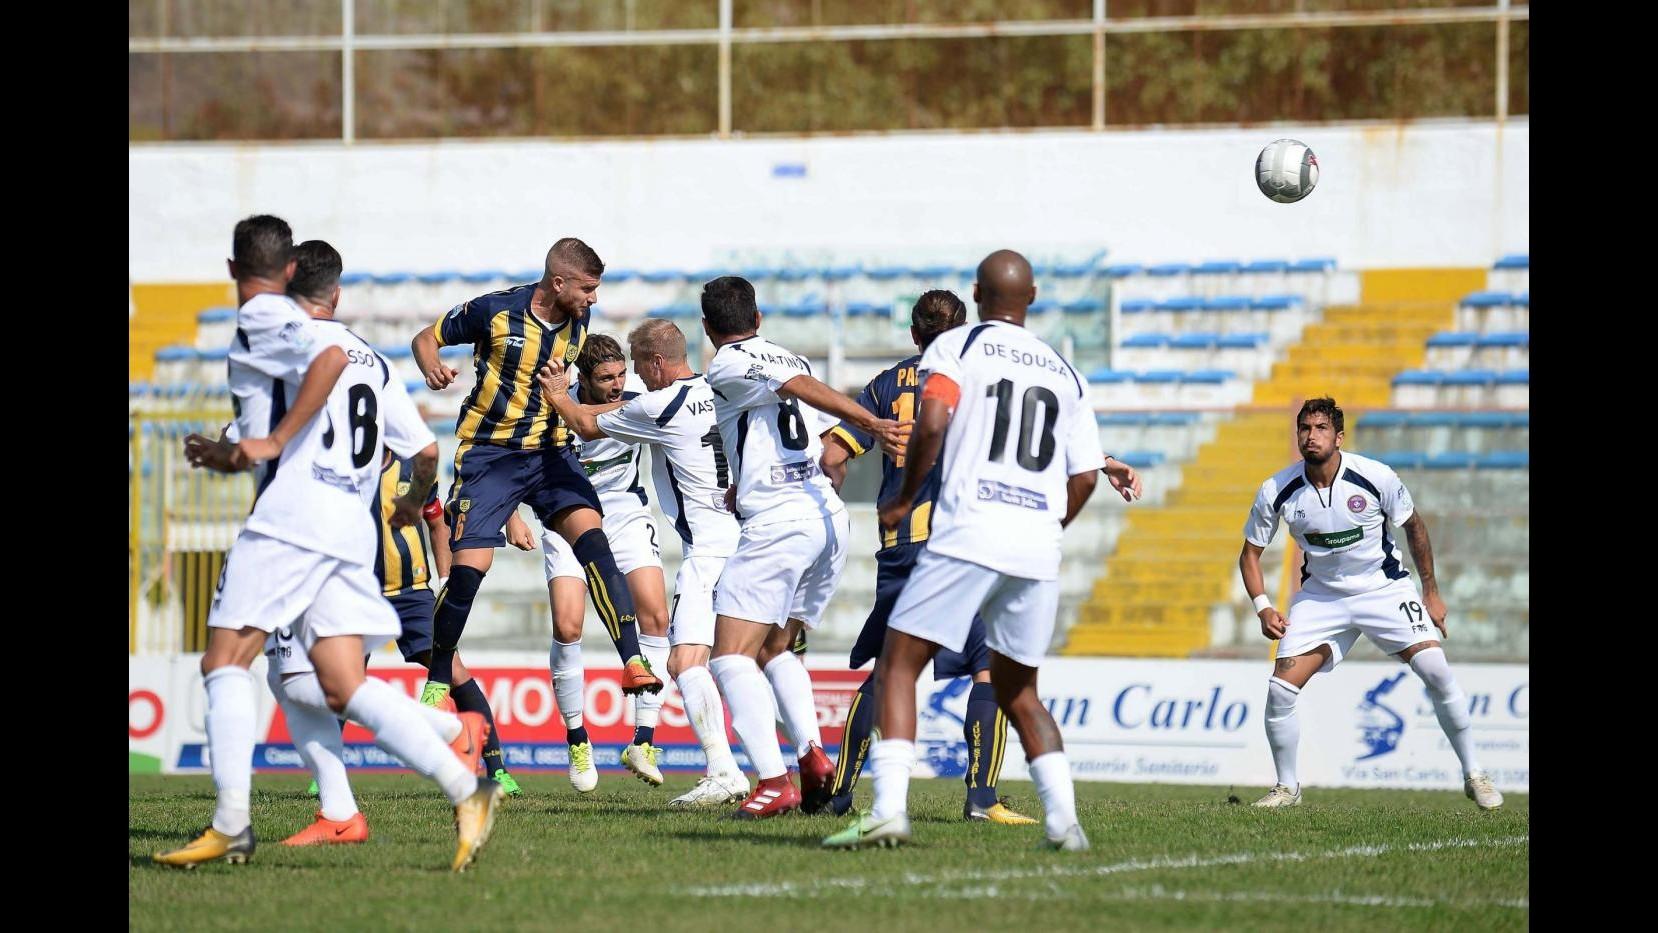 Serie C, Juve Stabia batte Fondi 2-0